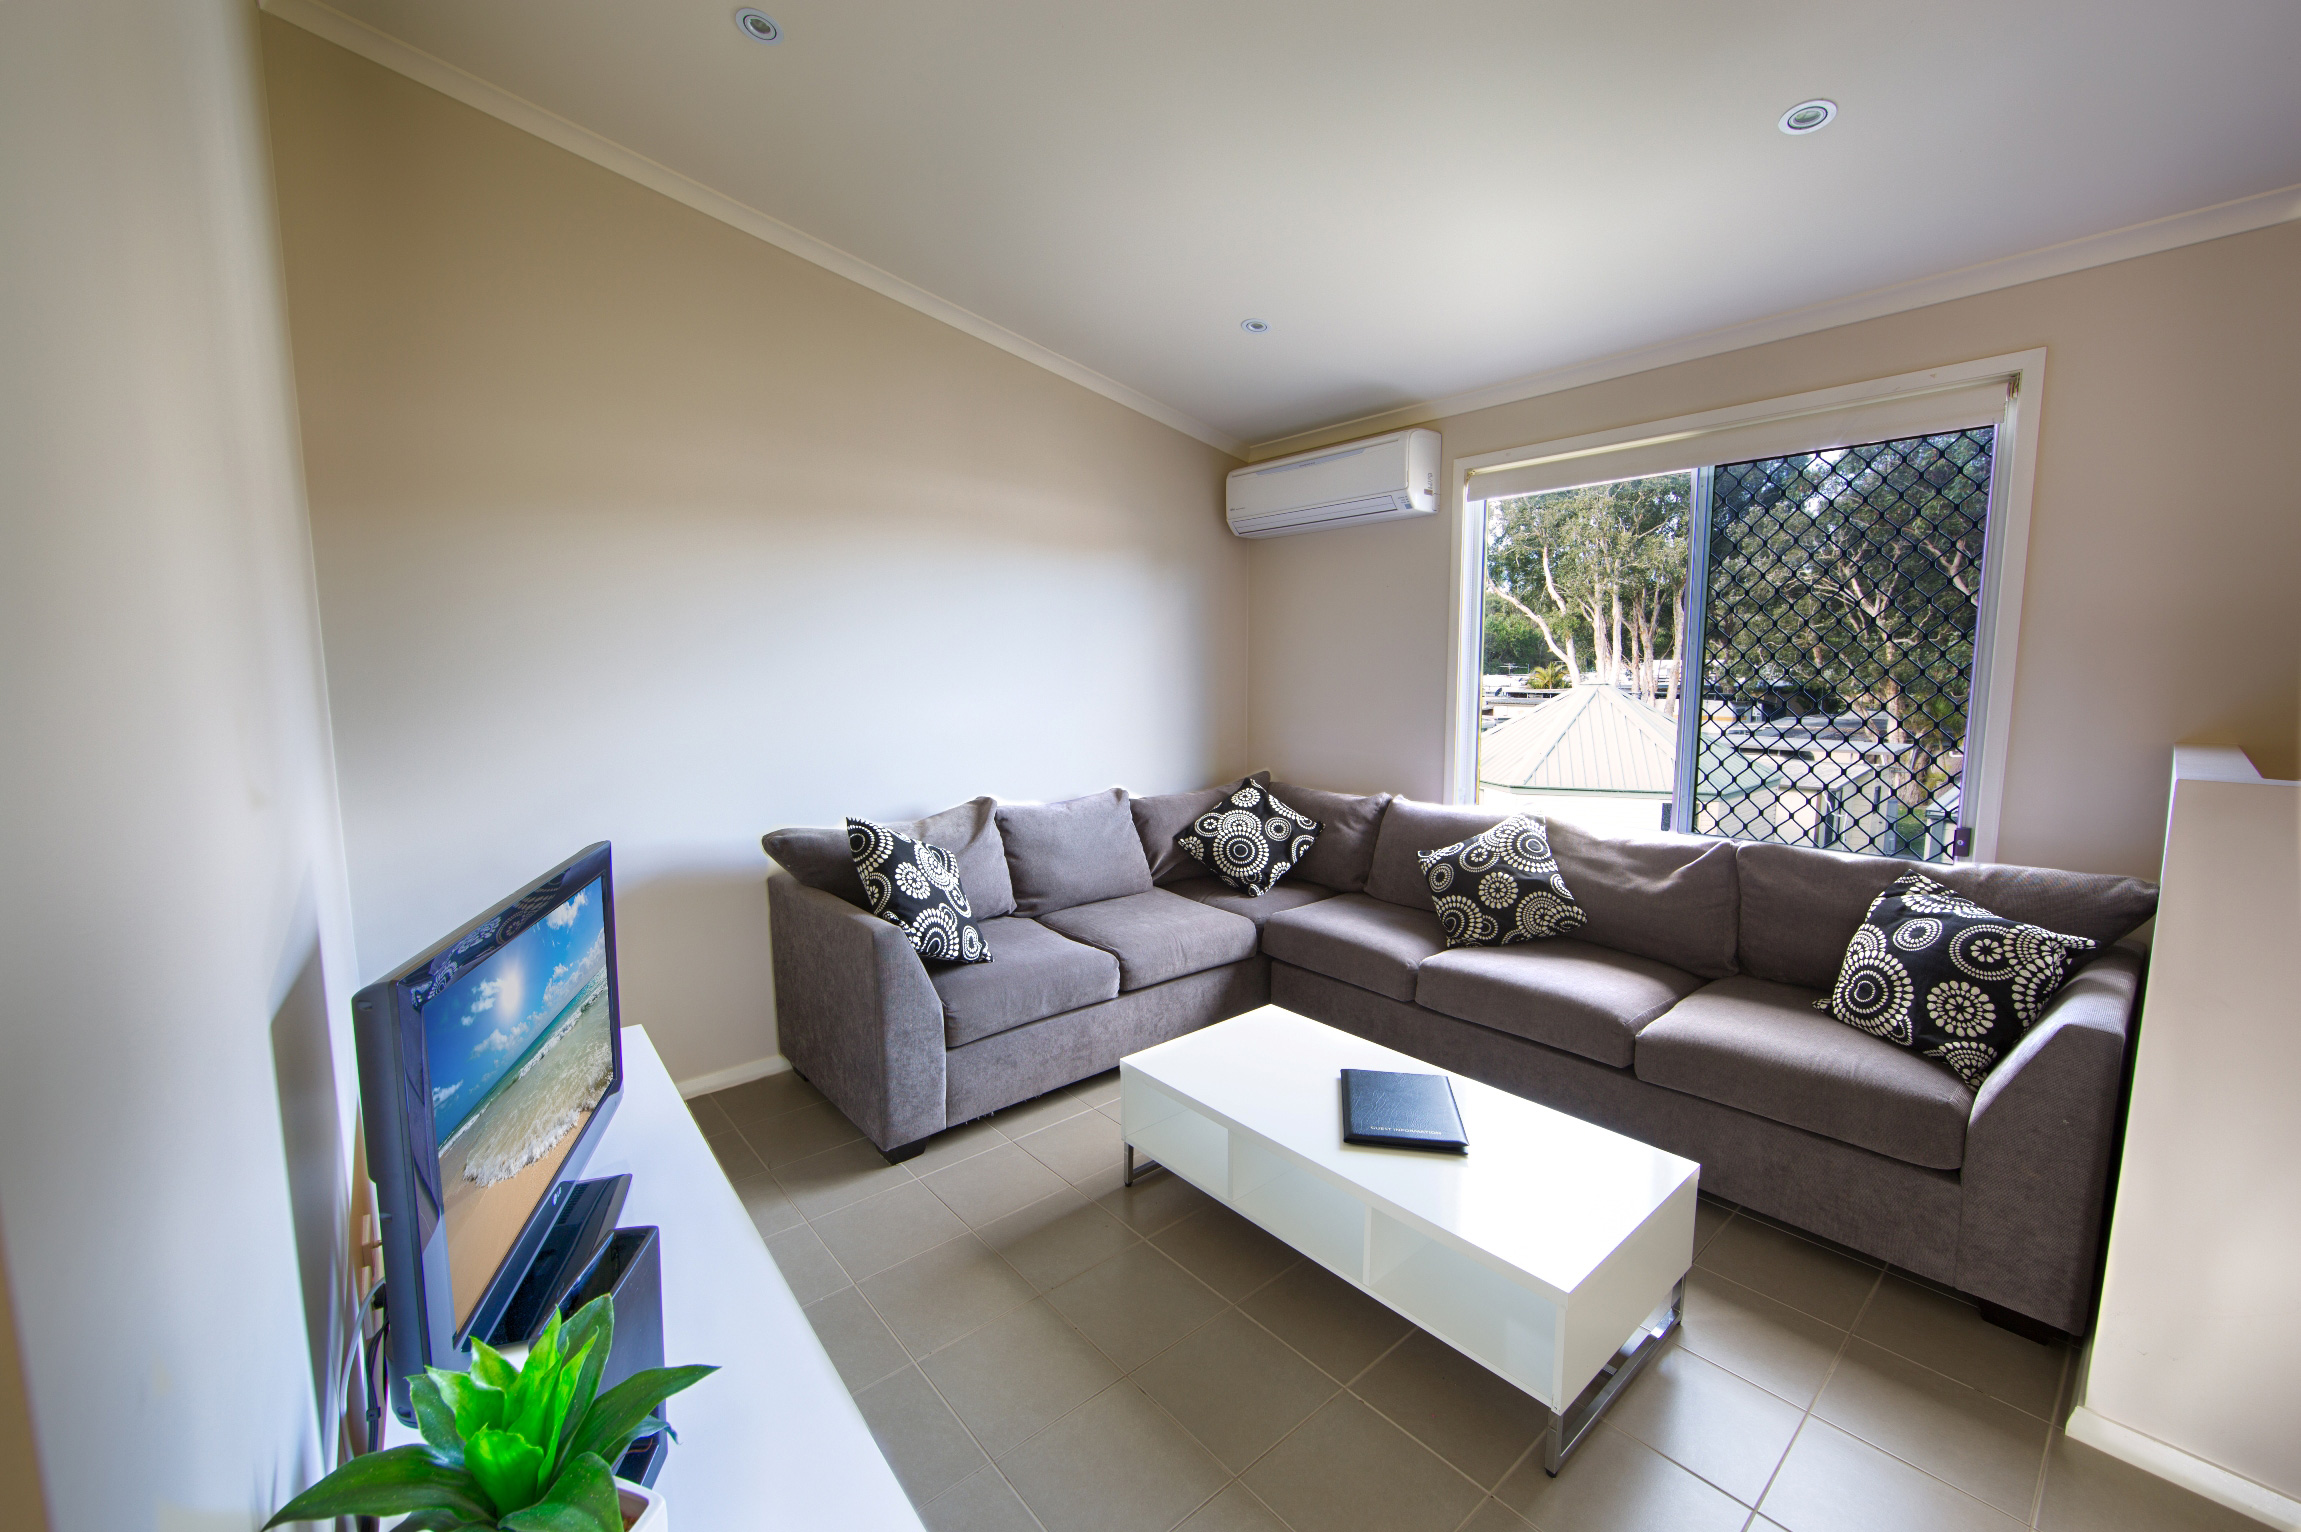 Apartment-Pic-3-lounge.jpg